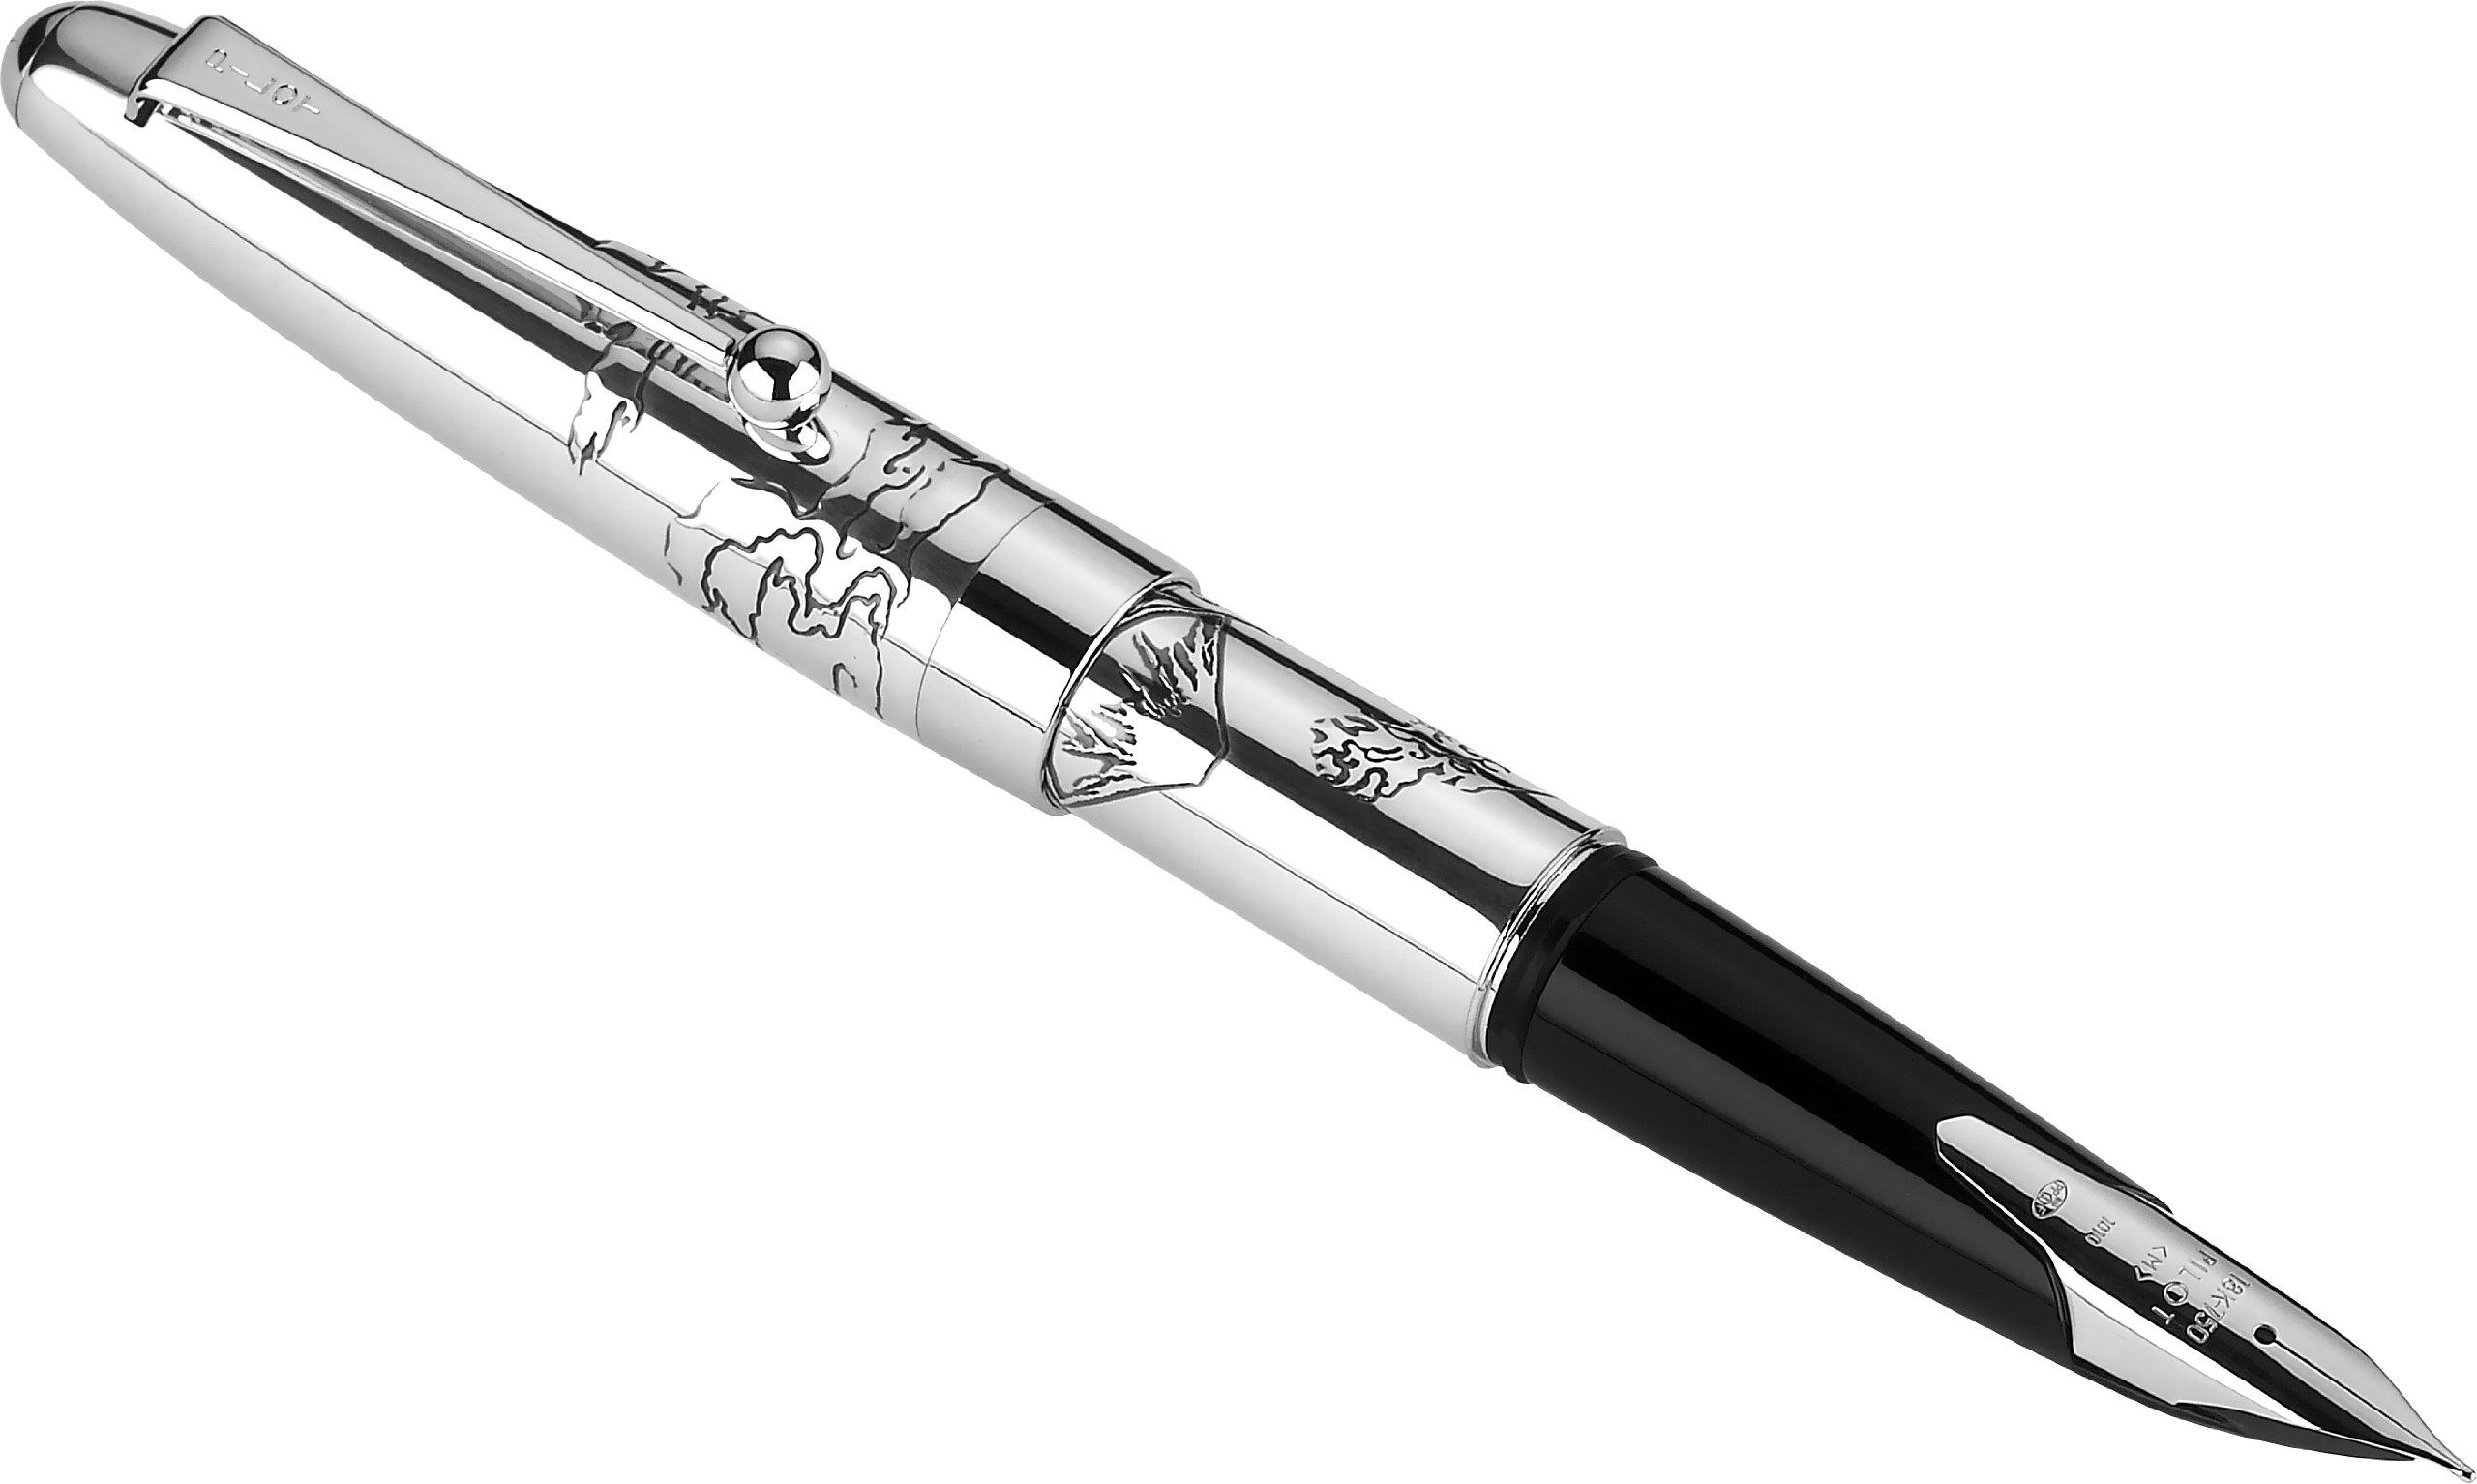 PILOT Namiki Sterling Collection Fountain Pen, Mount Fuji Design Barrel, Medium Nib (60685)